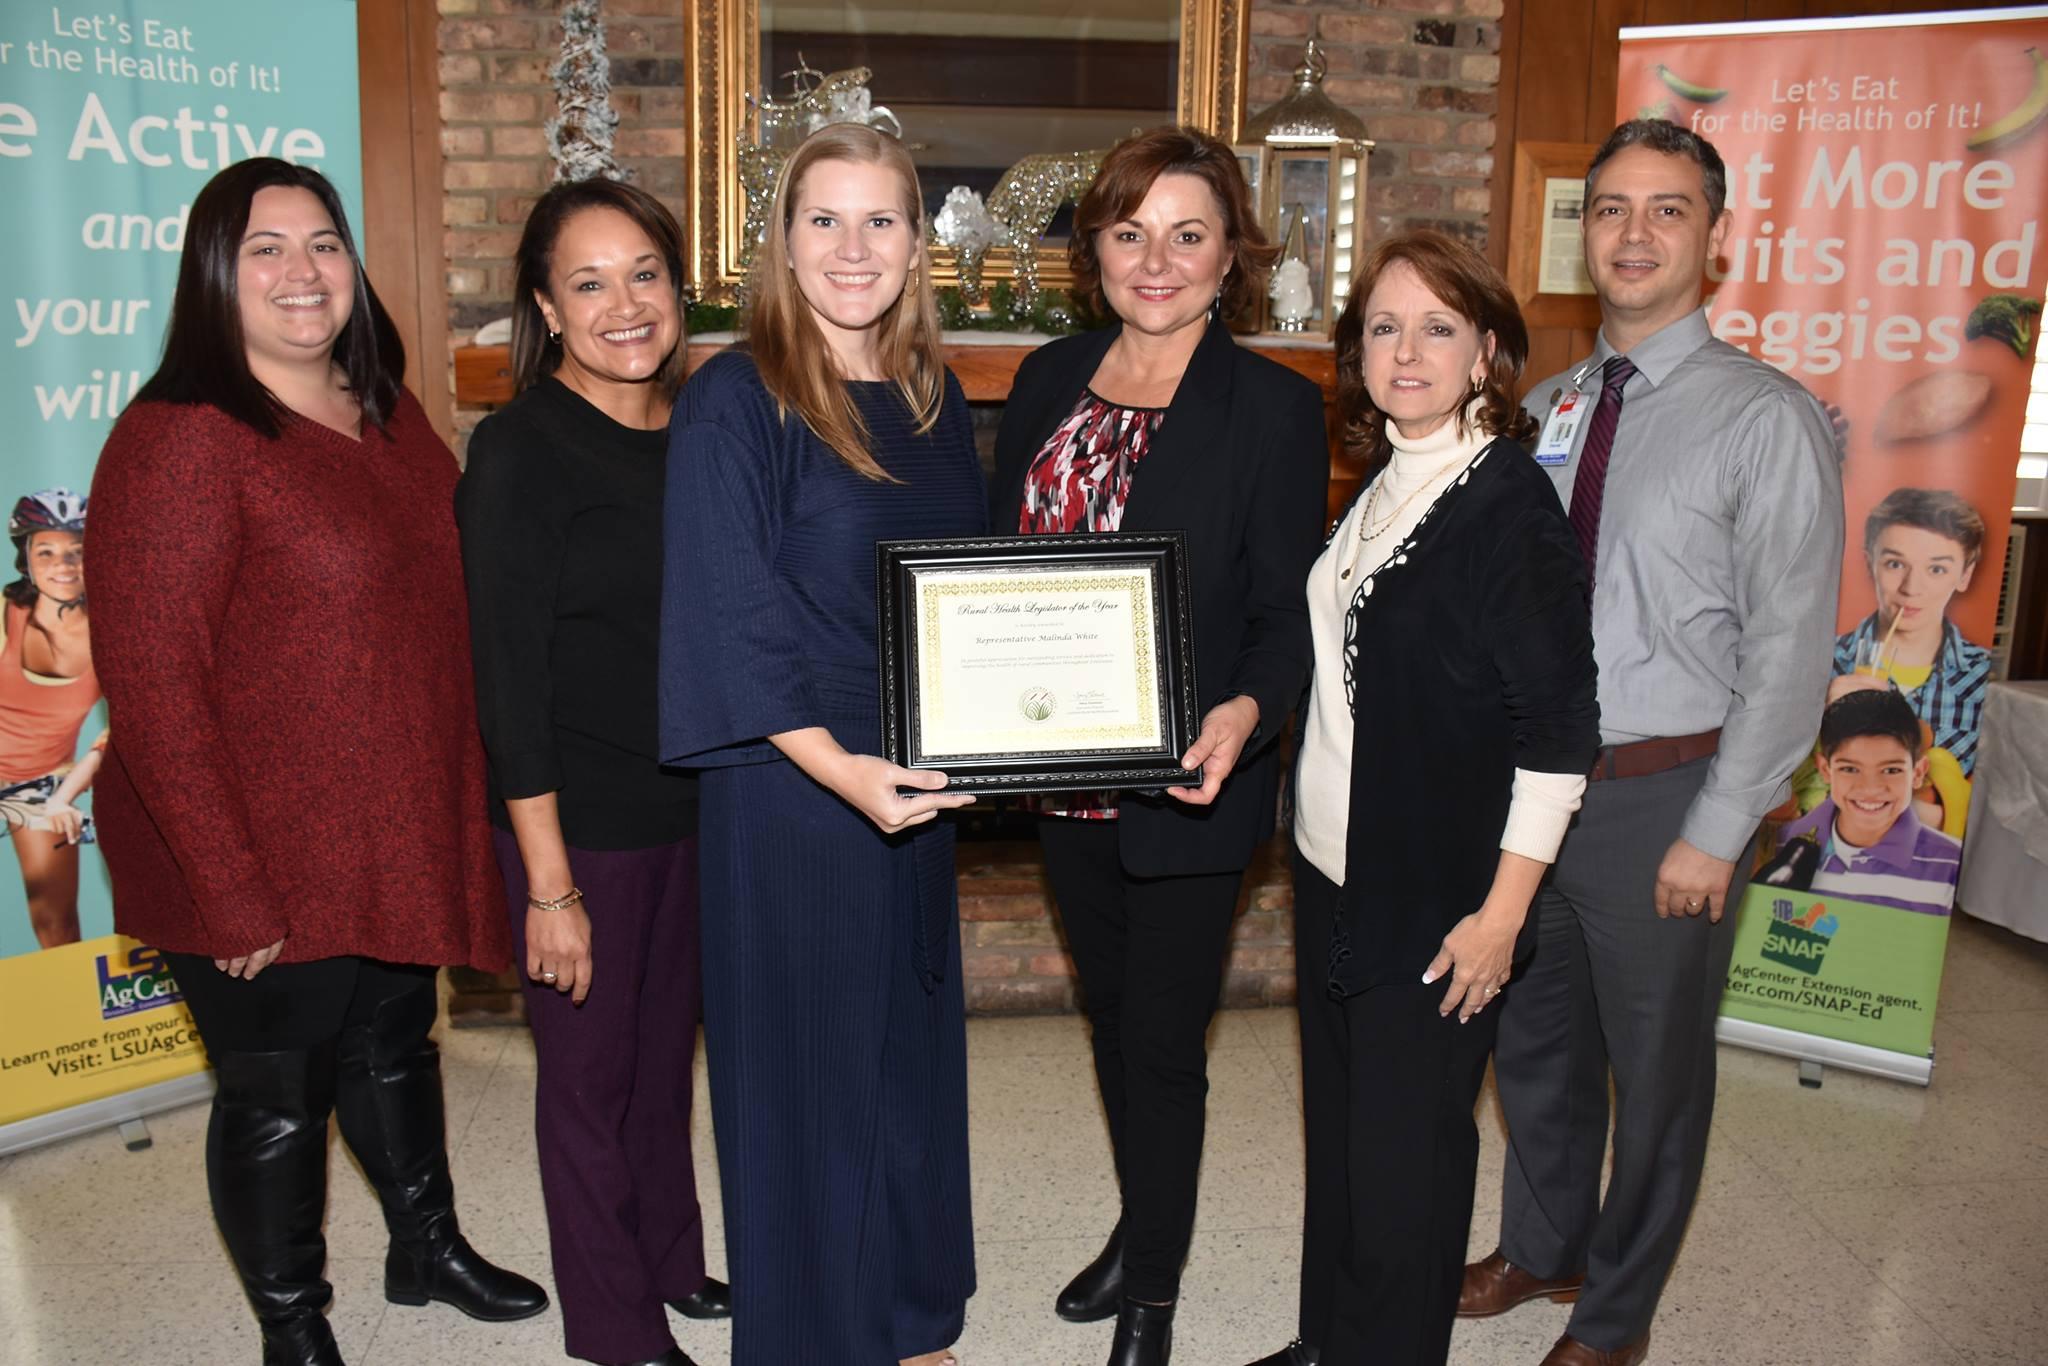 Representative Malinda White, receiving the Rural Health Association 2018 Legislator of the Year award